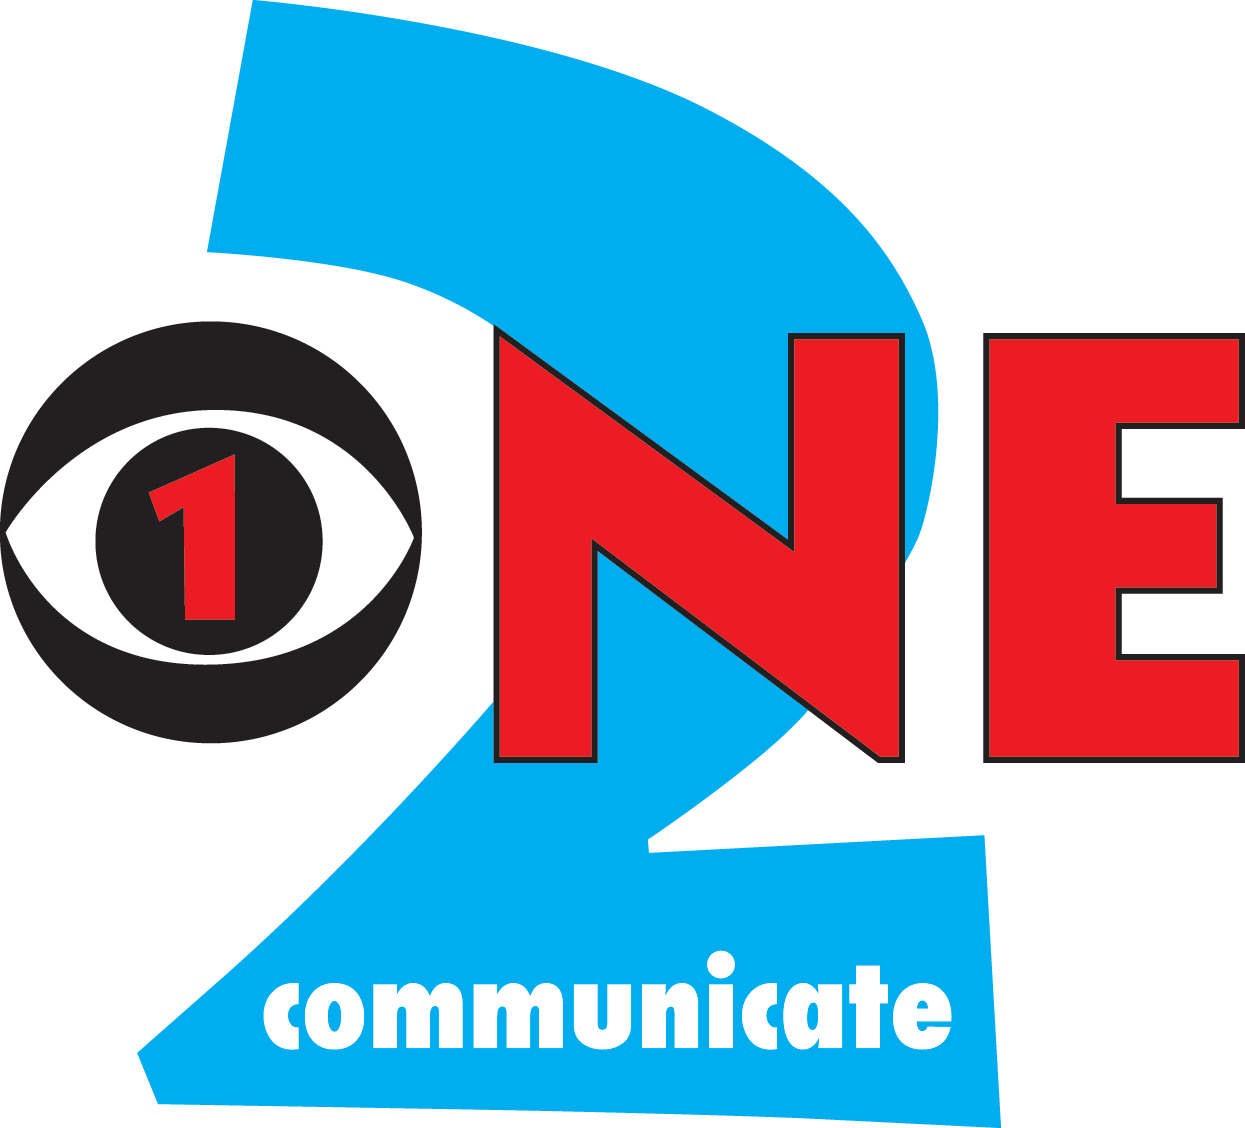 1-2 Communicate